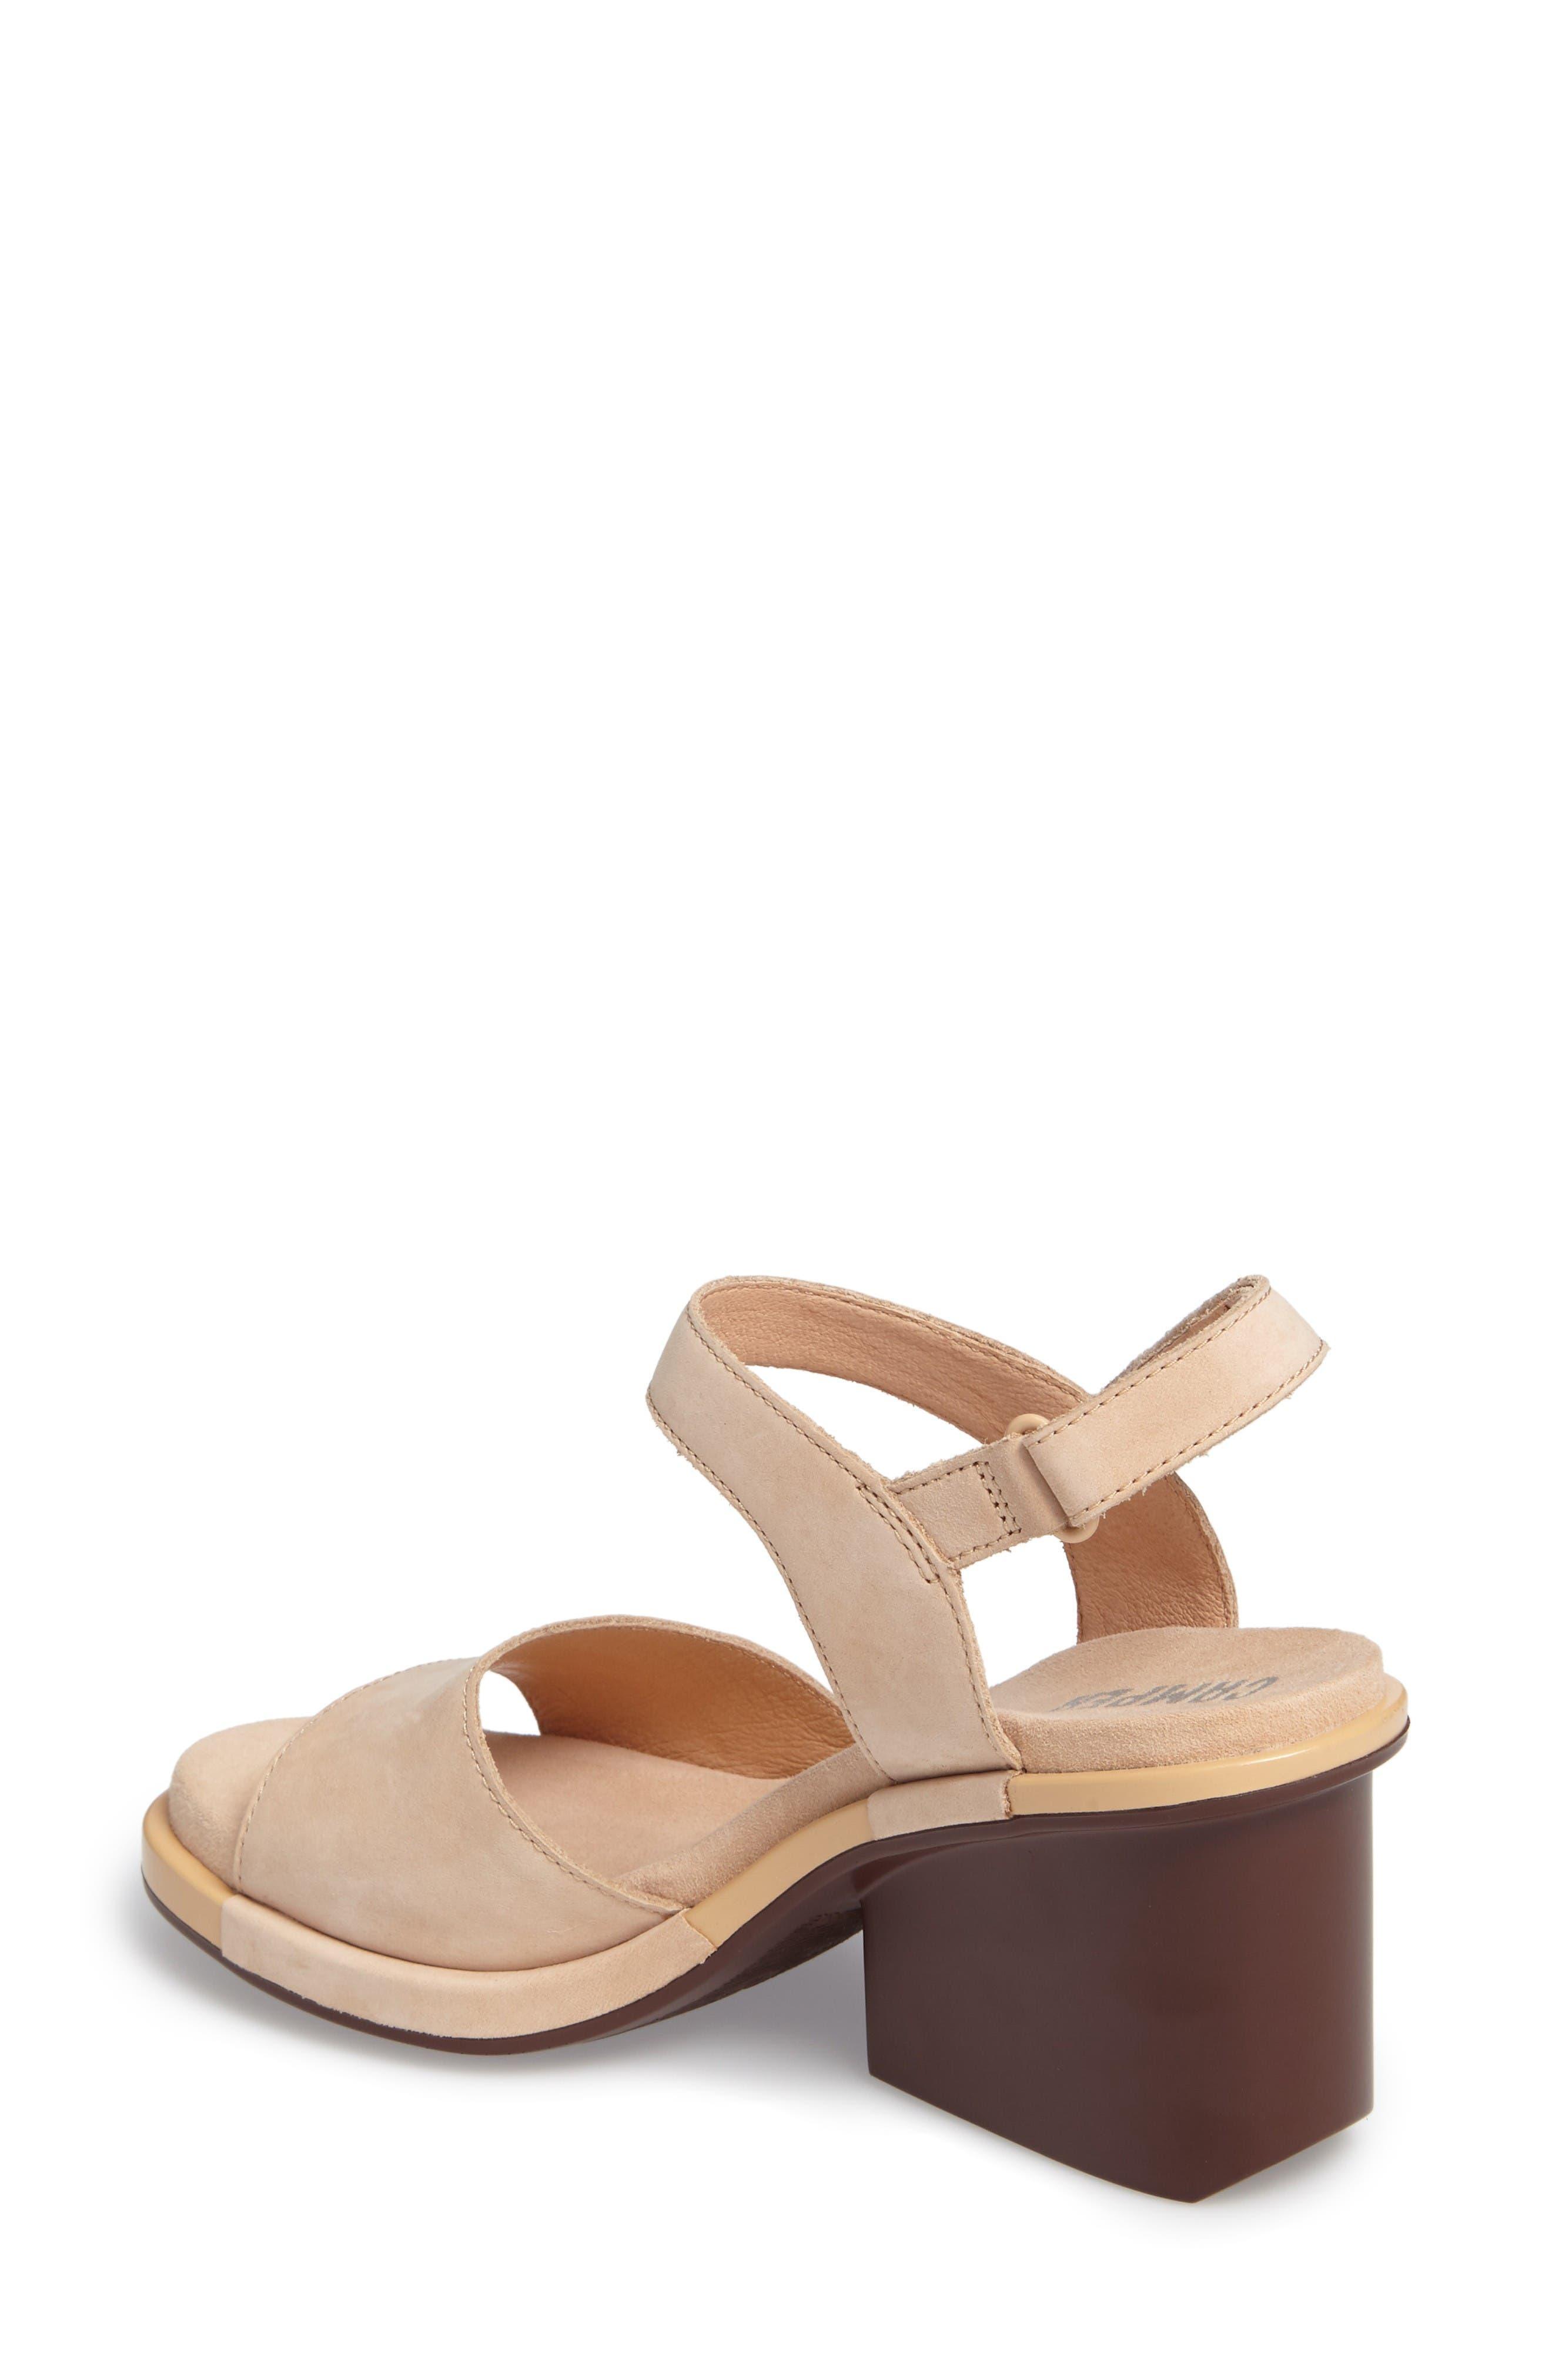 Ivy Ankle Strap Sandal,                             Alternate thumbnail 2, color,                             Beige Leather